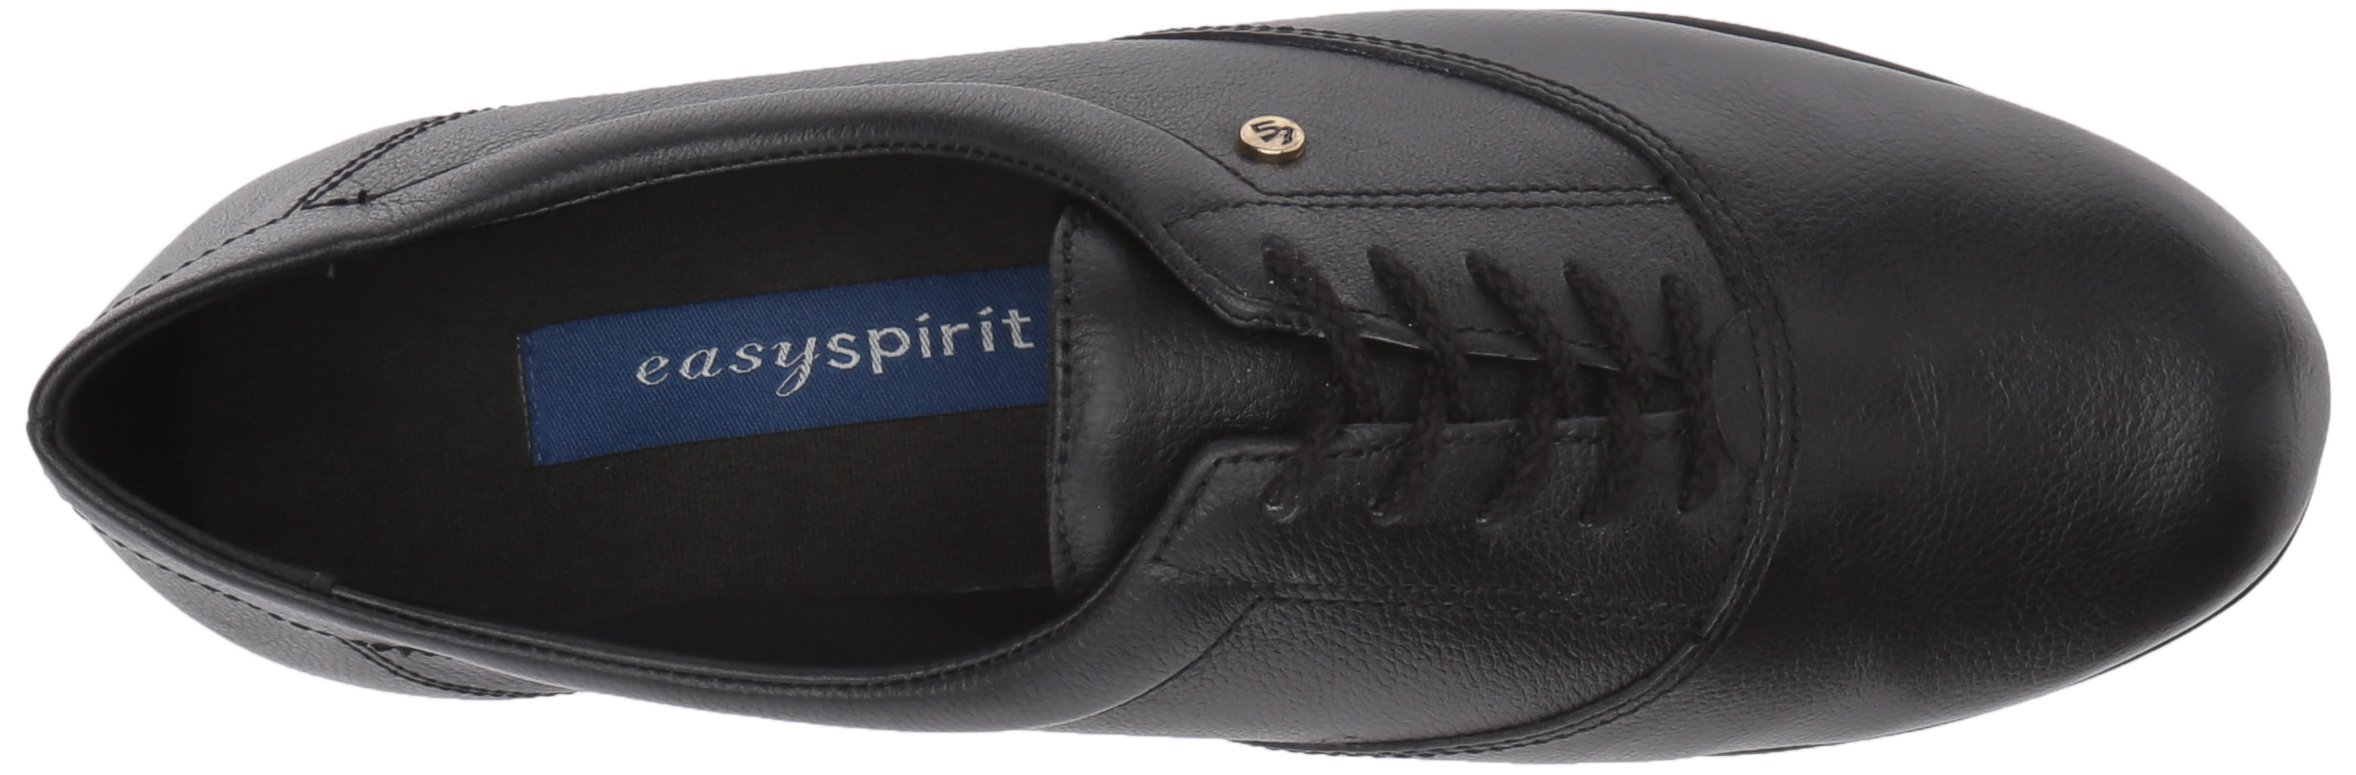 Easy Spirit Women's ESMOTION8 Shoe, black, 8.5 W US by Easy Spirit (Image #8)